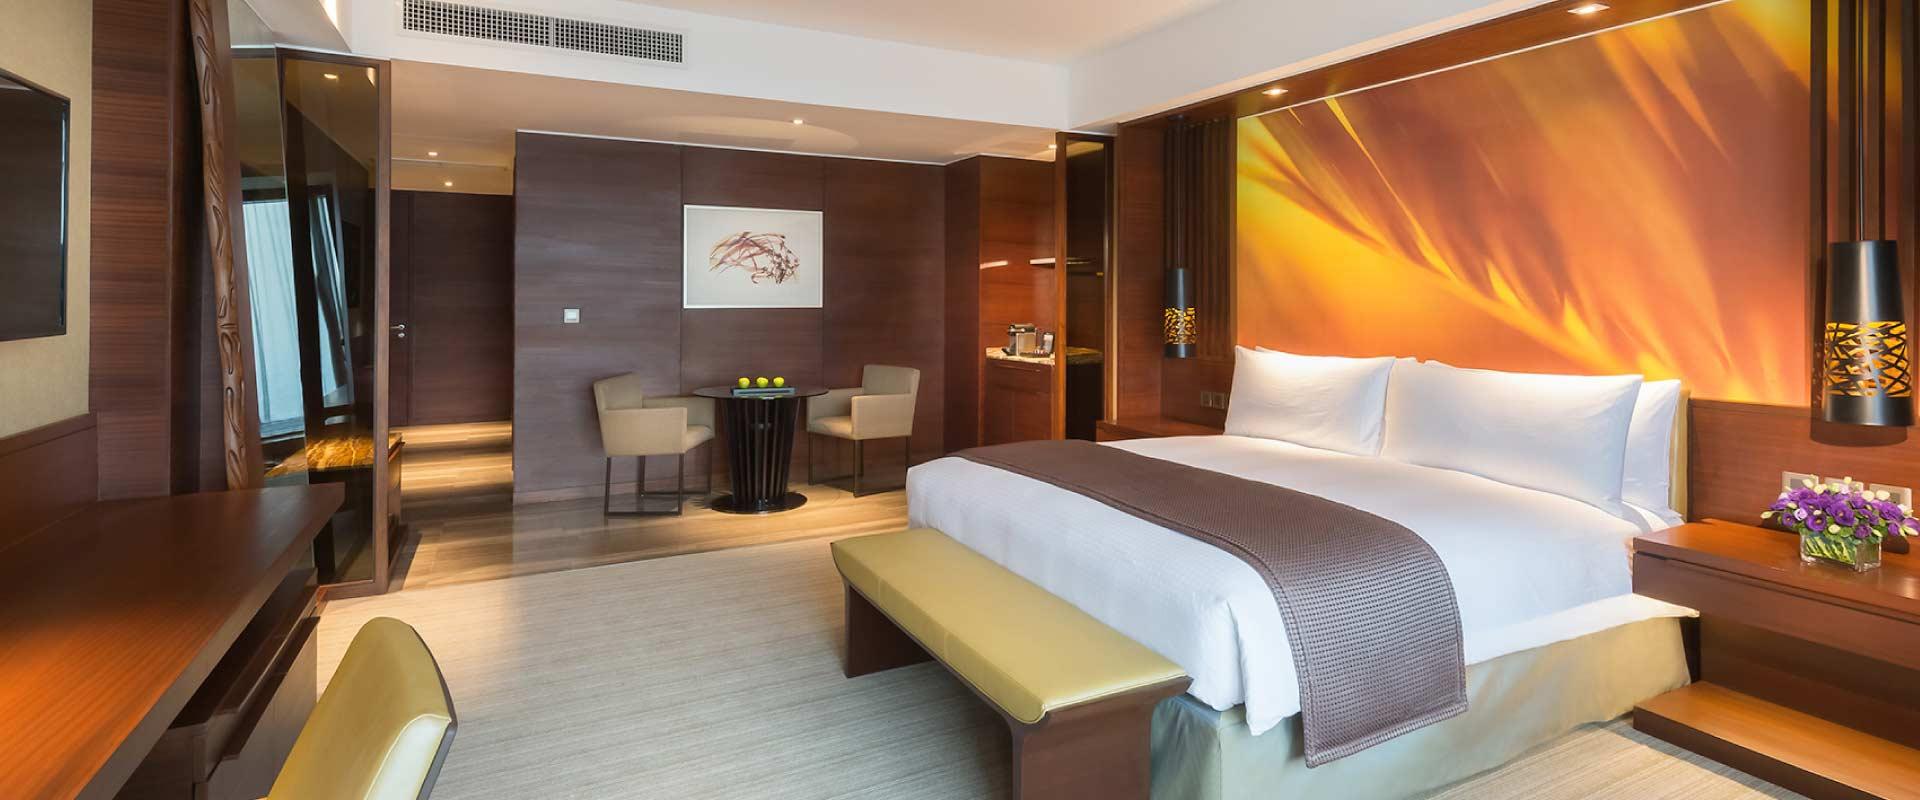 Marco Polo Manila An Award Winning Hotel In The Heart Of